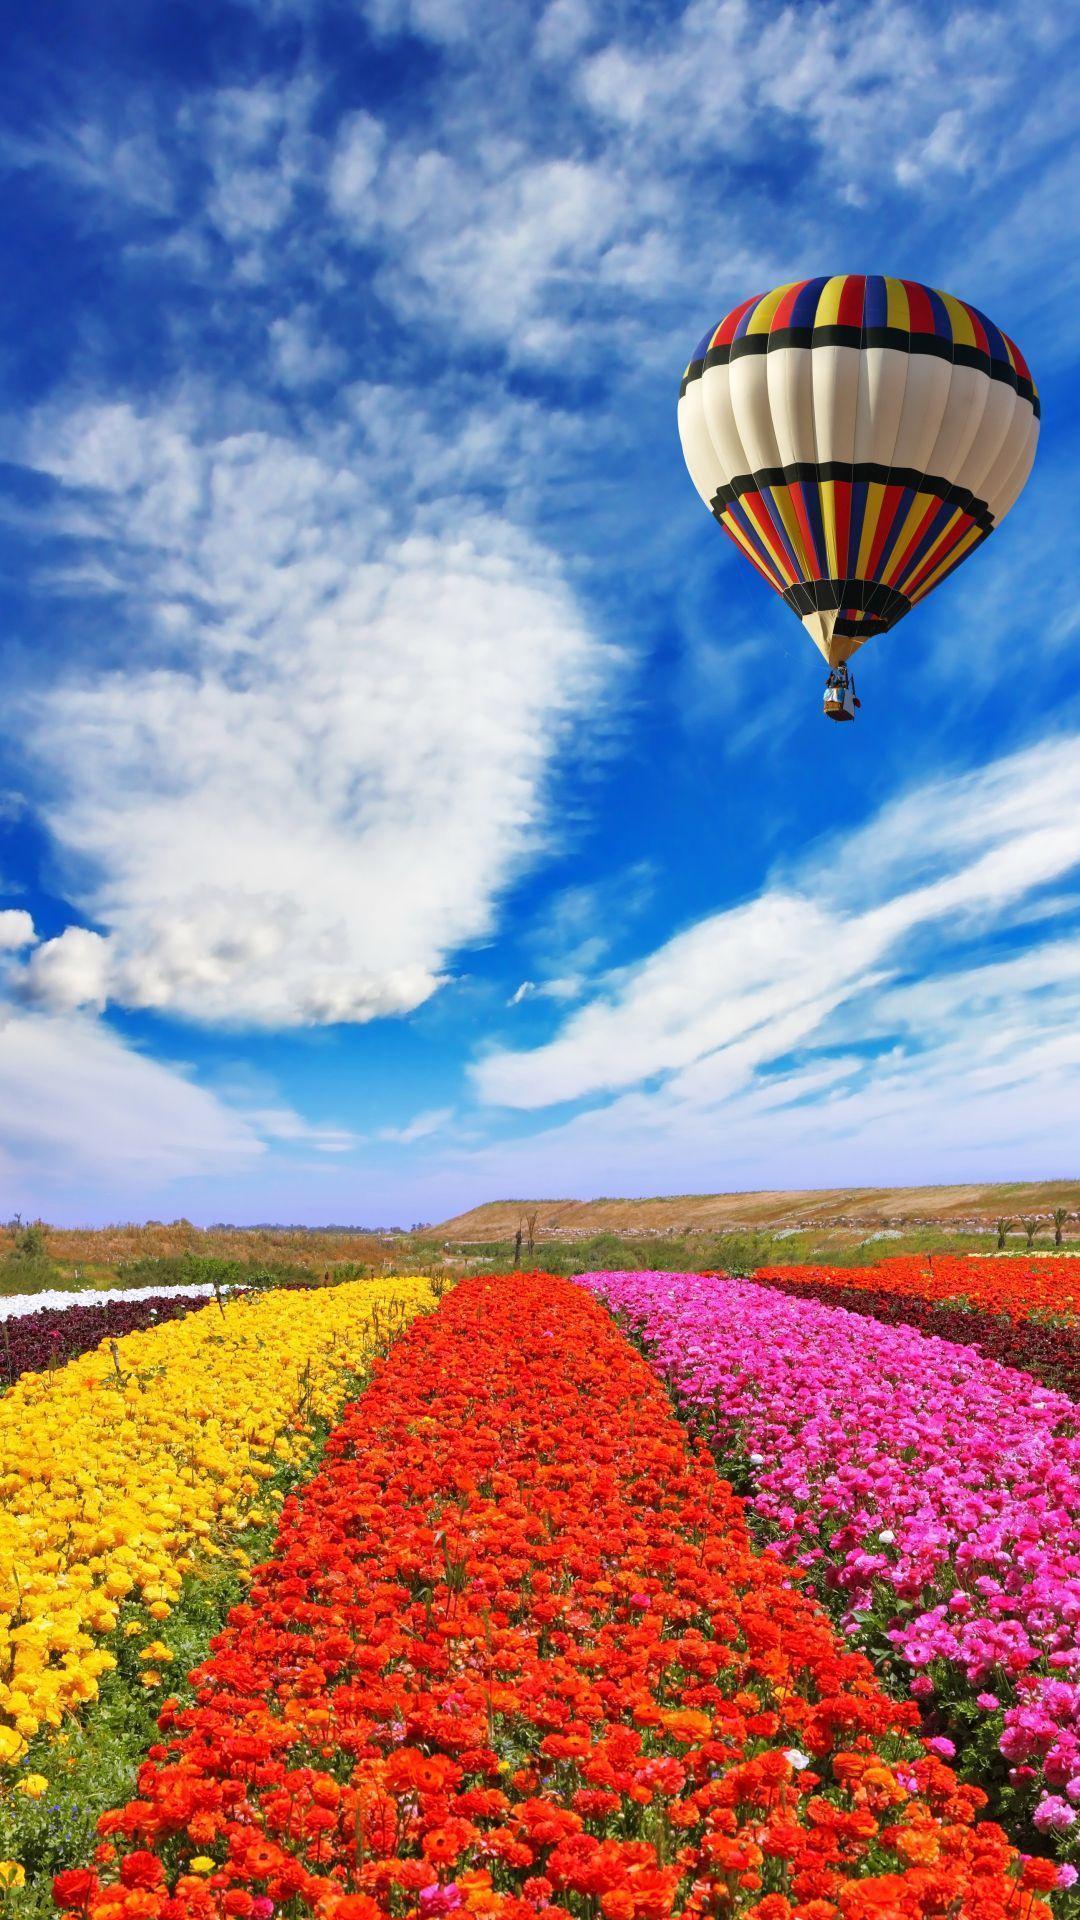 Iphone 7 Plus Vehicles Air Balloon Wallpaper Id 653418